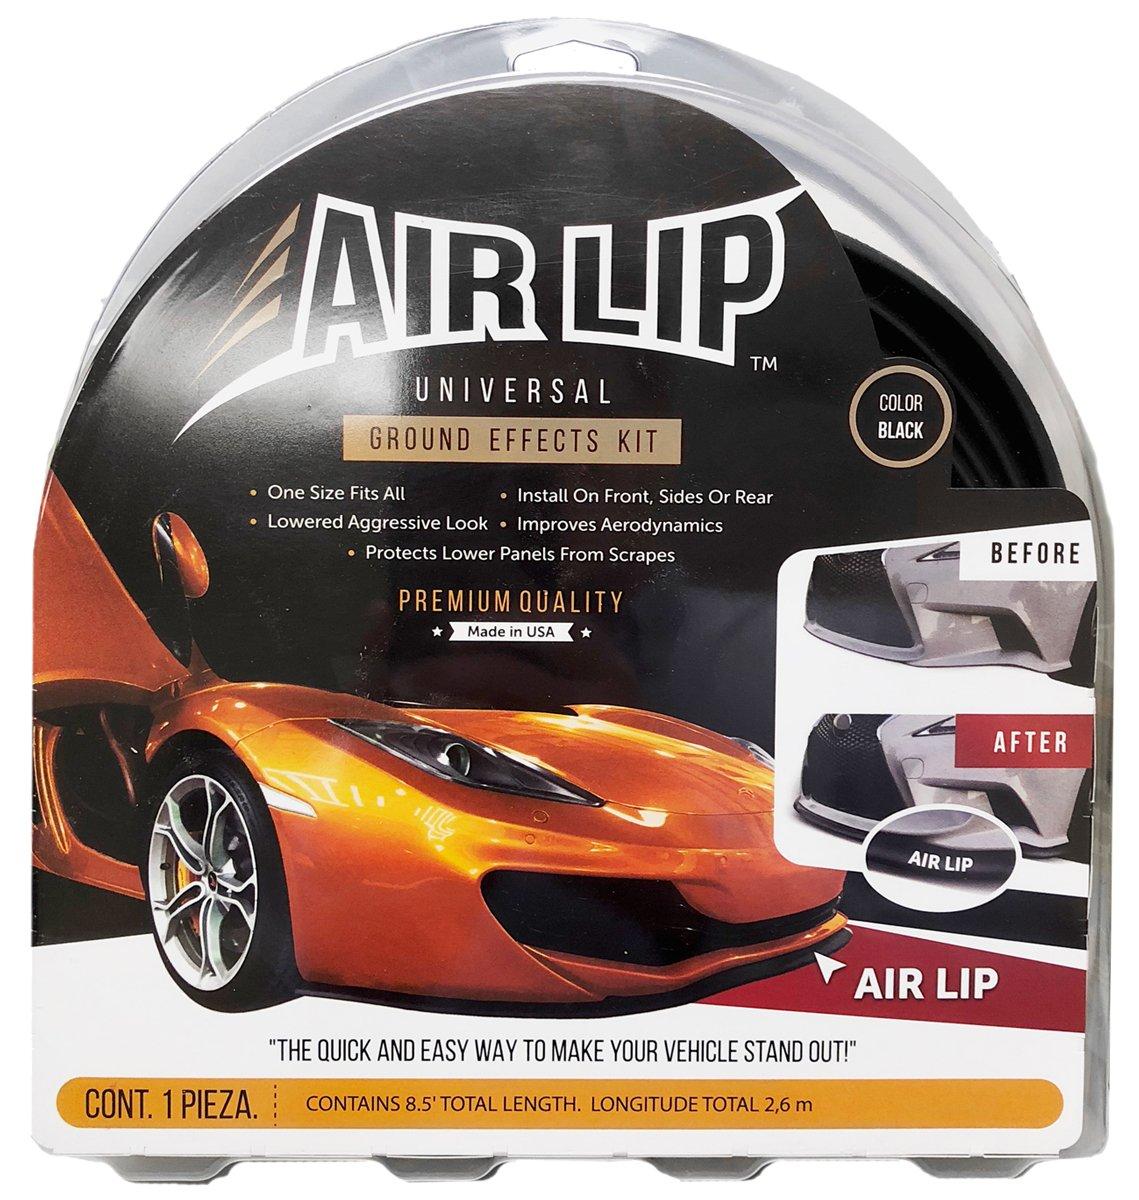 8 x 6 Black Universal Ground Effects Air Lip Kit